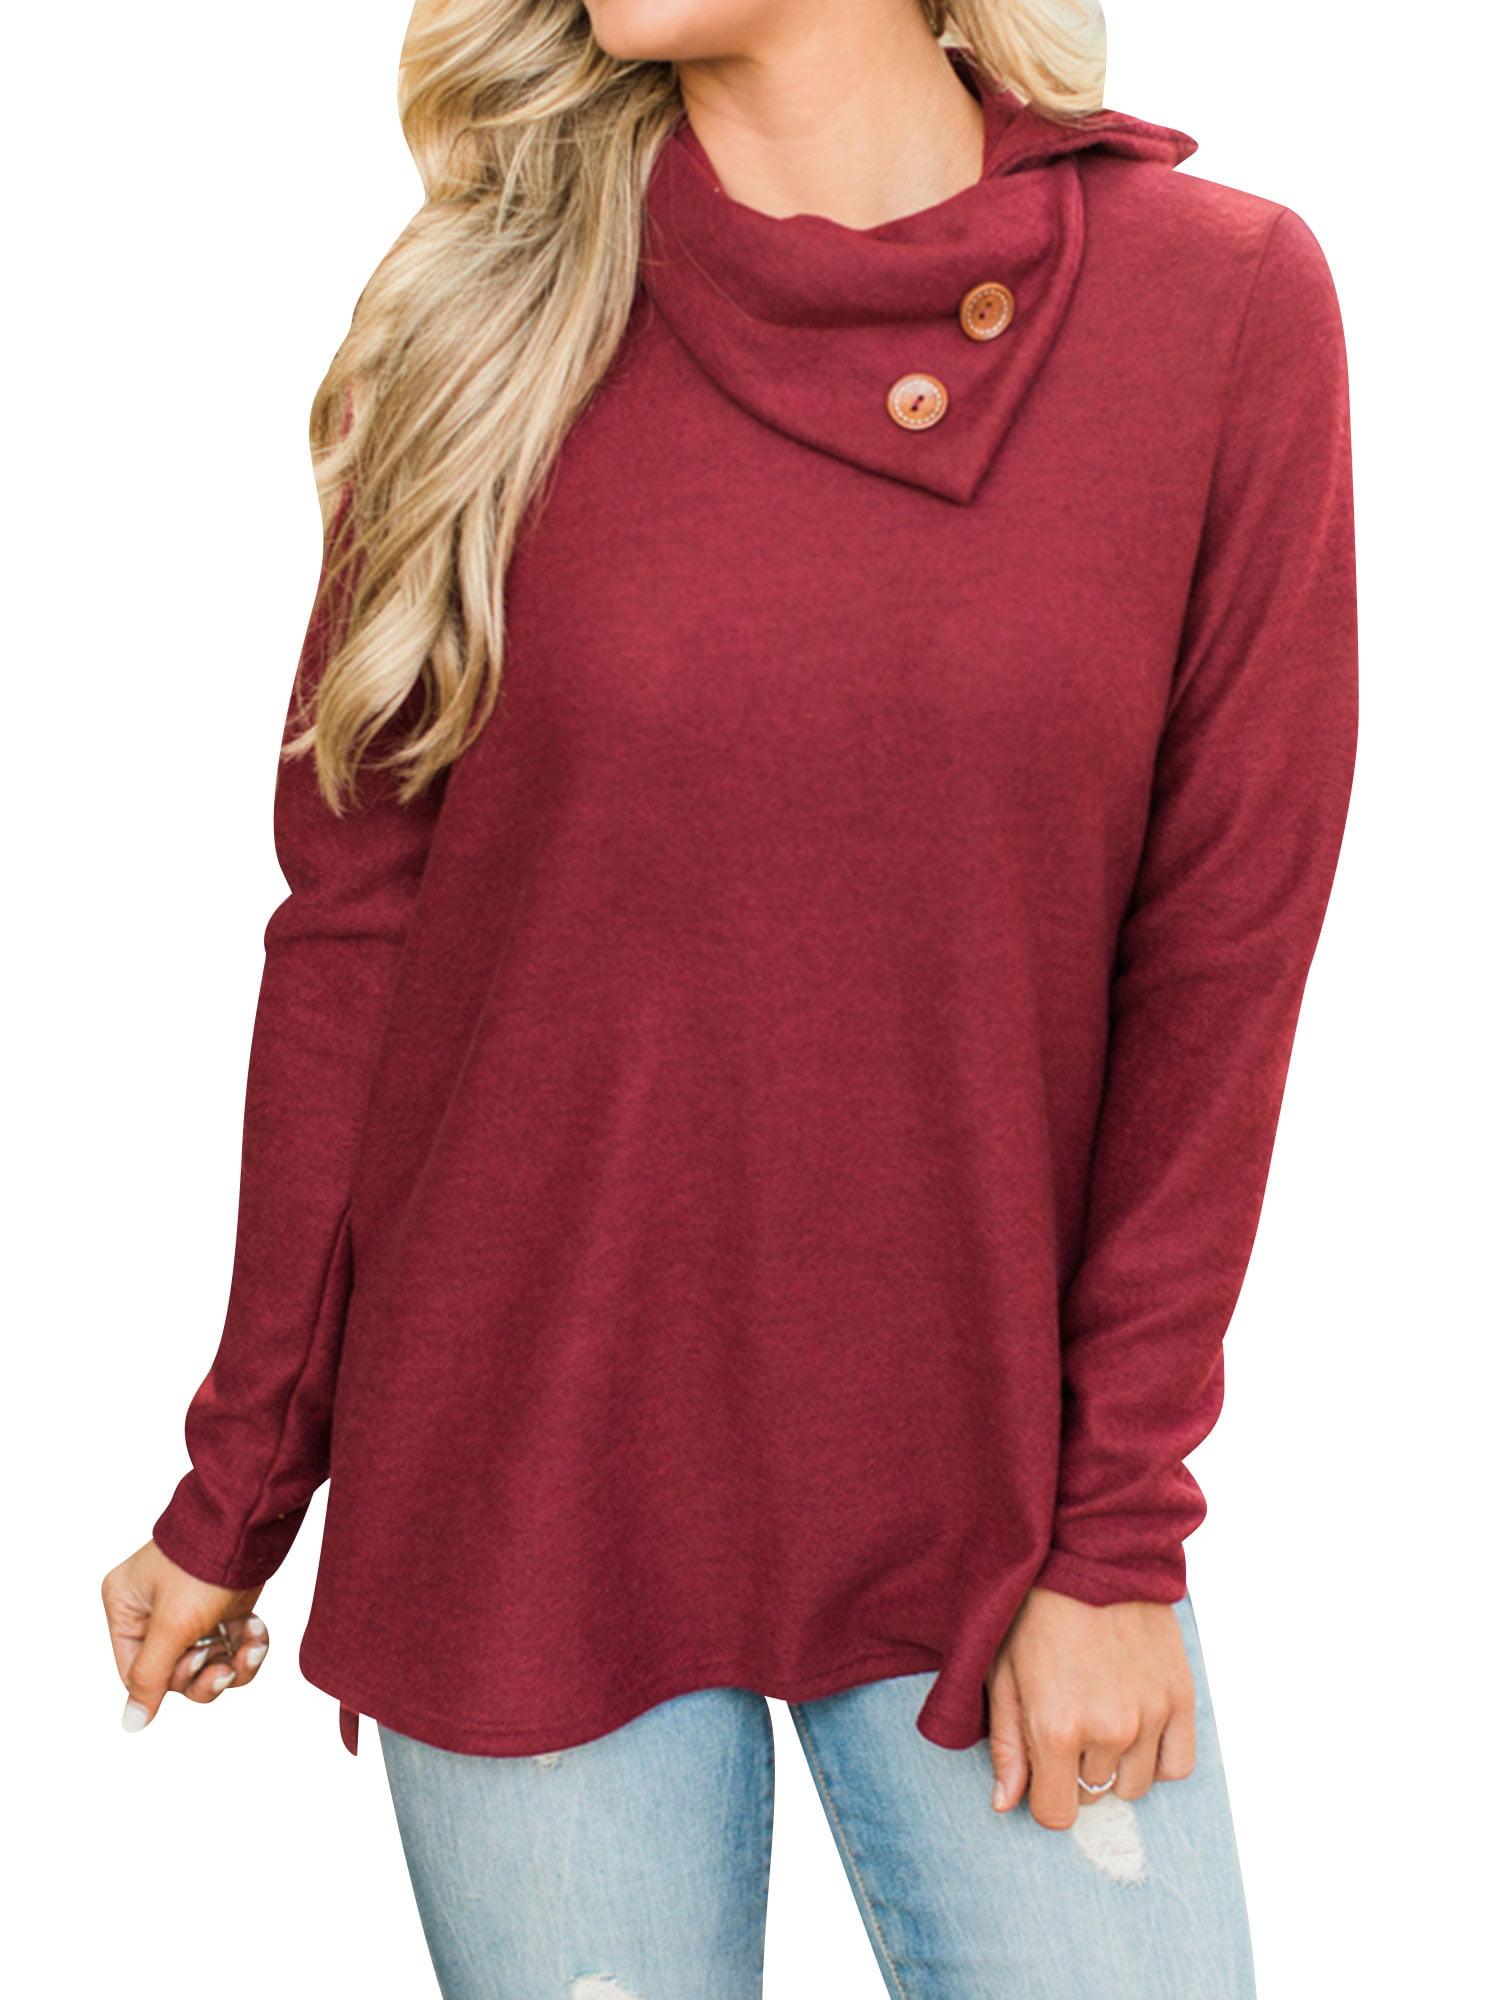 e0312f79227 Starvnc Women Long Sleeve Button Cowl Neck Asymmetrical Hem Side ...